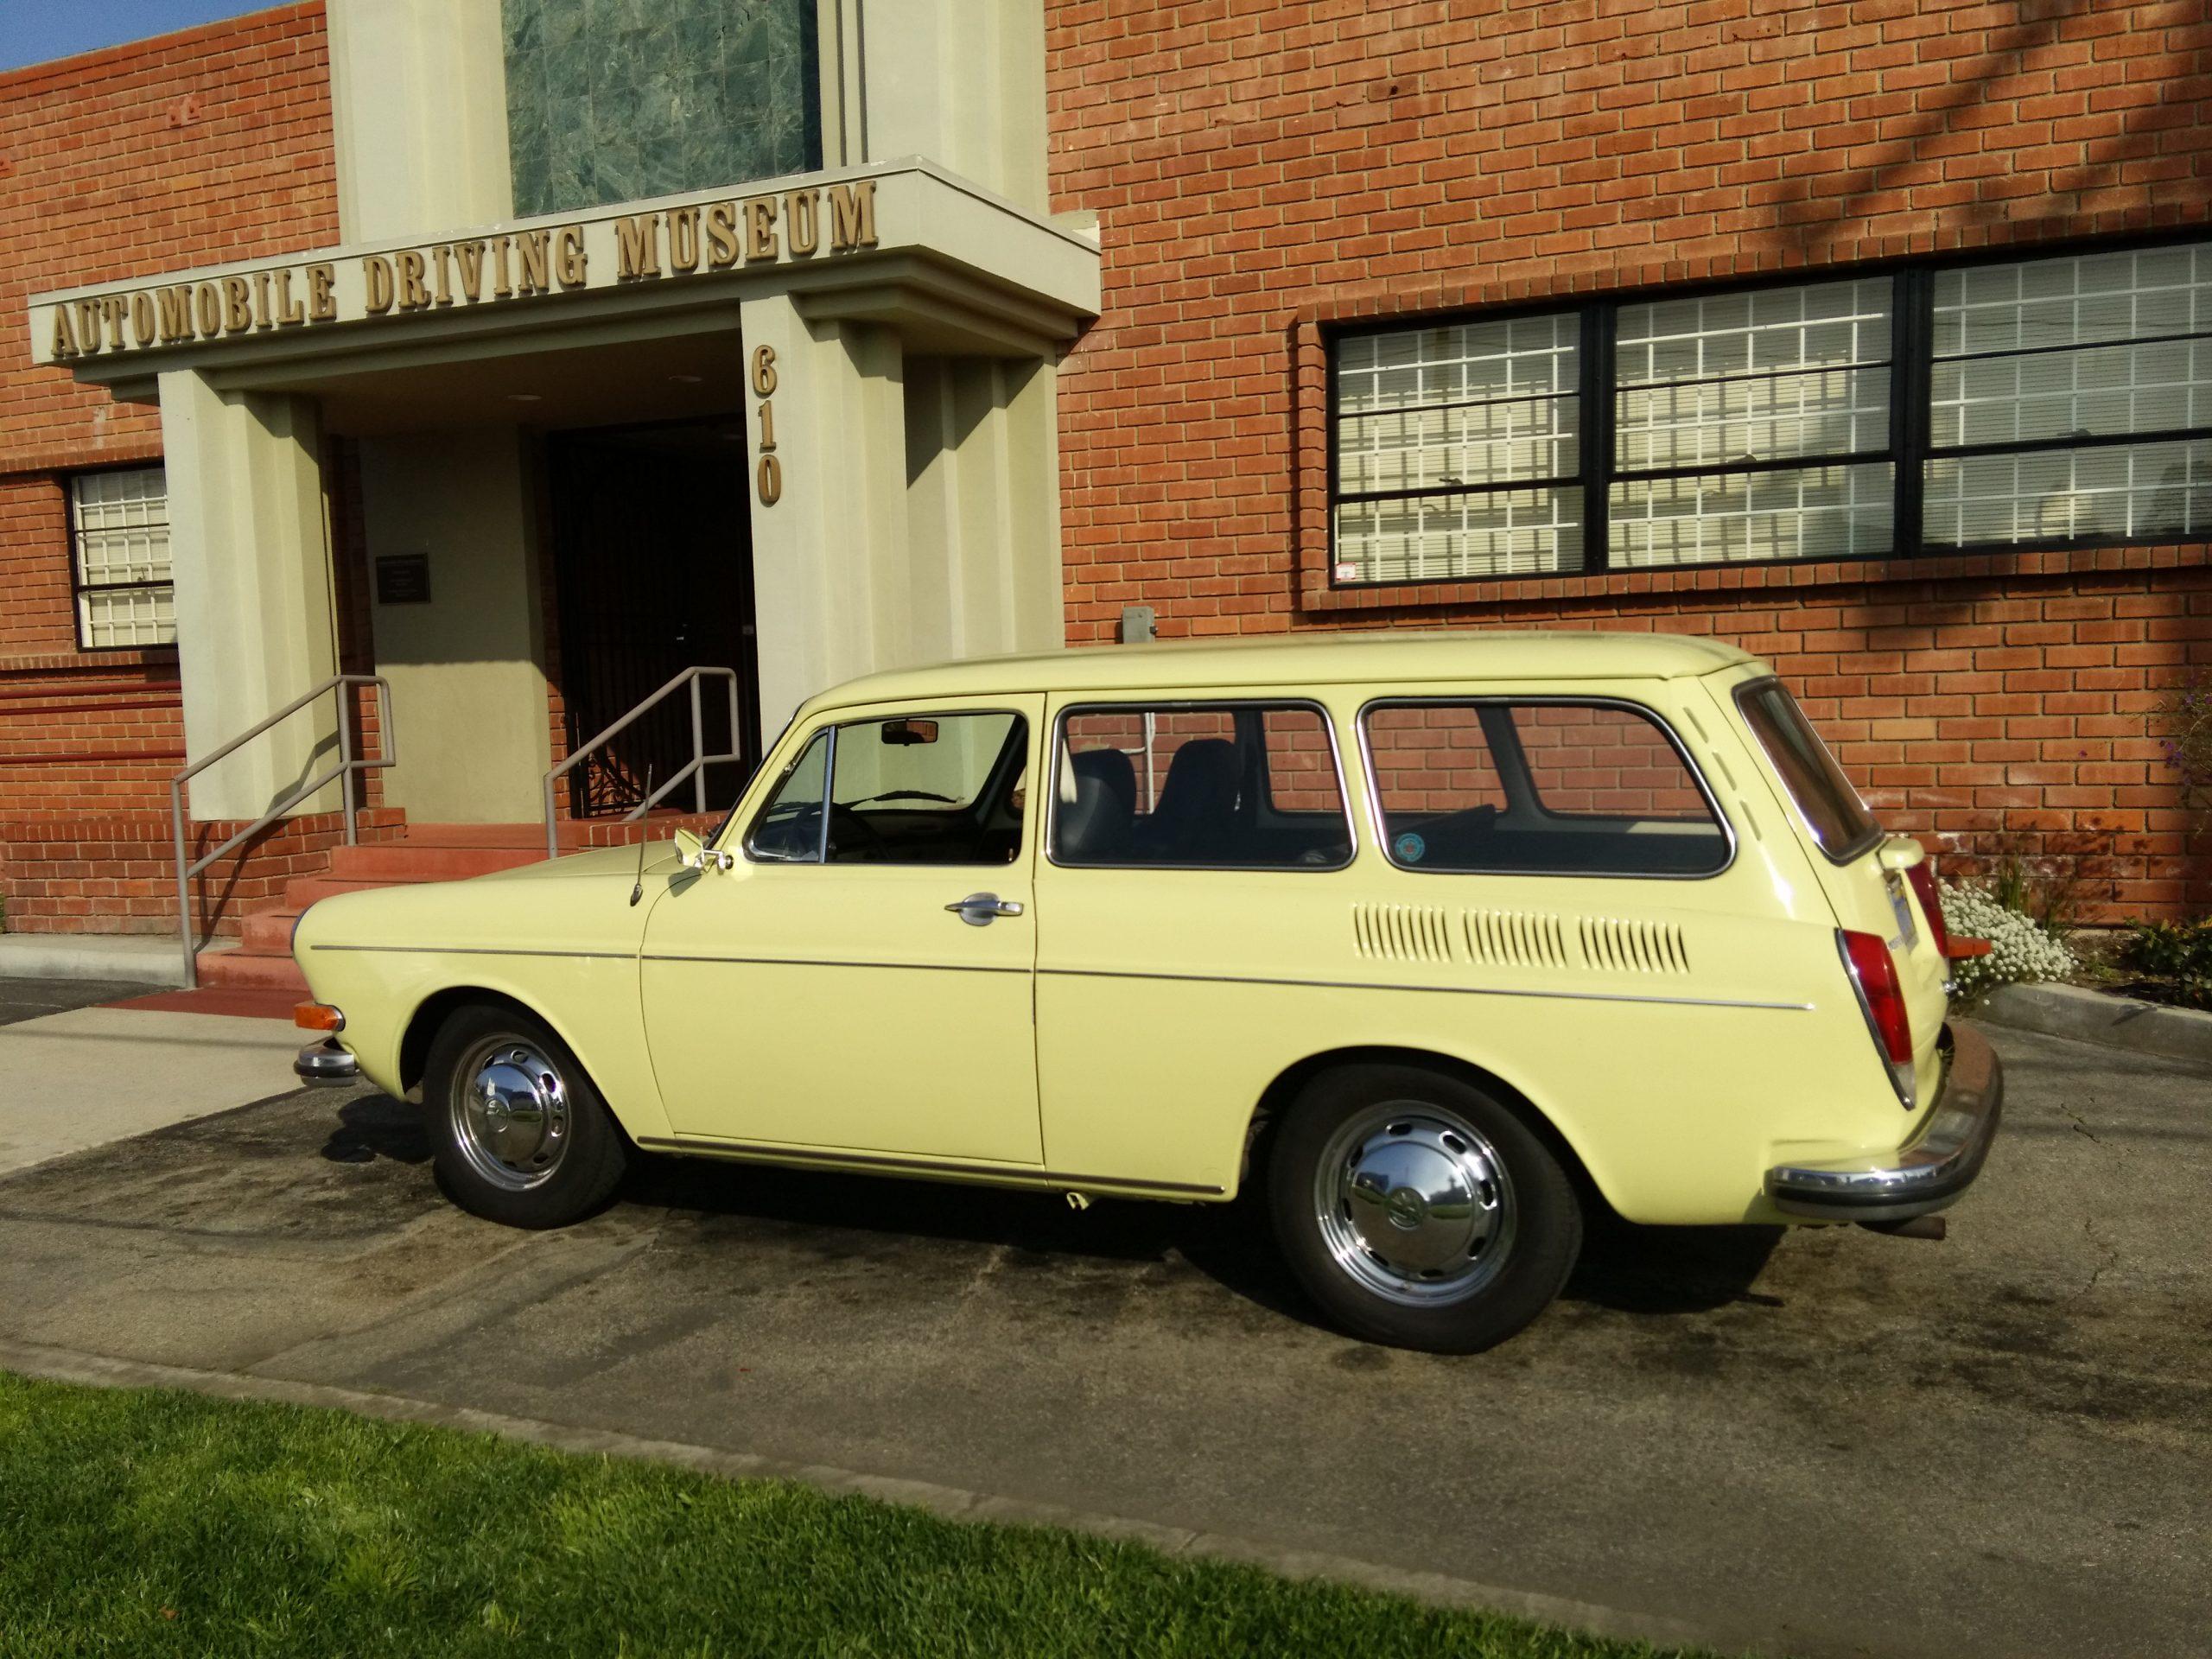 1971 VW Squareback for rent